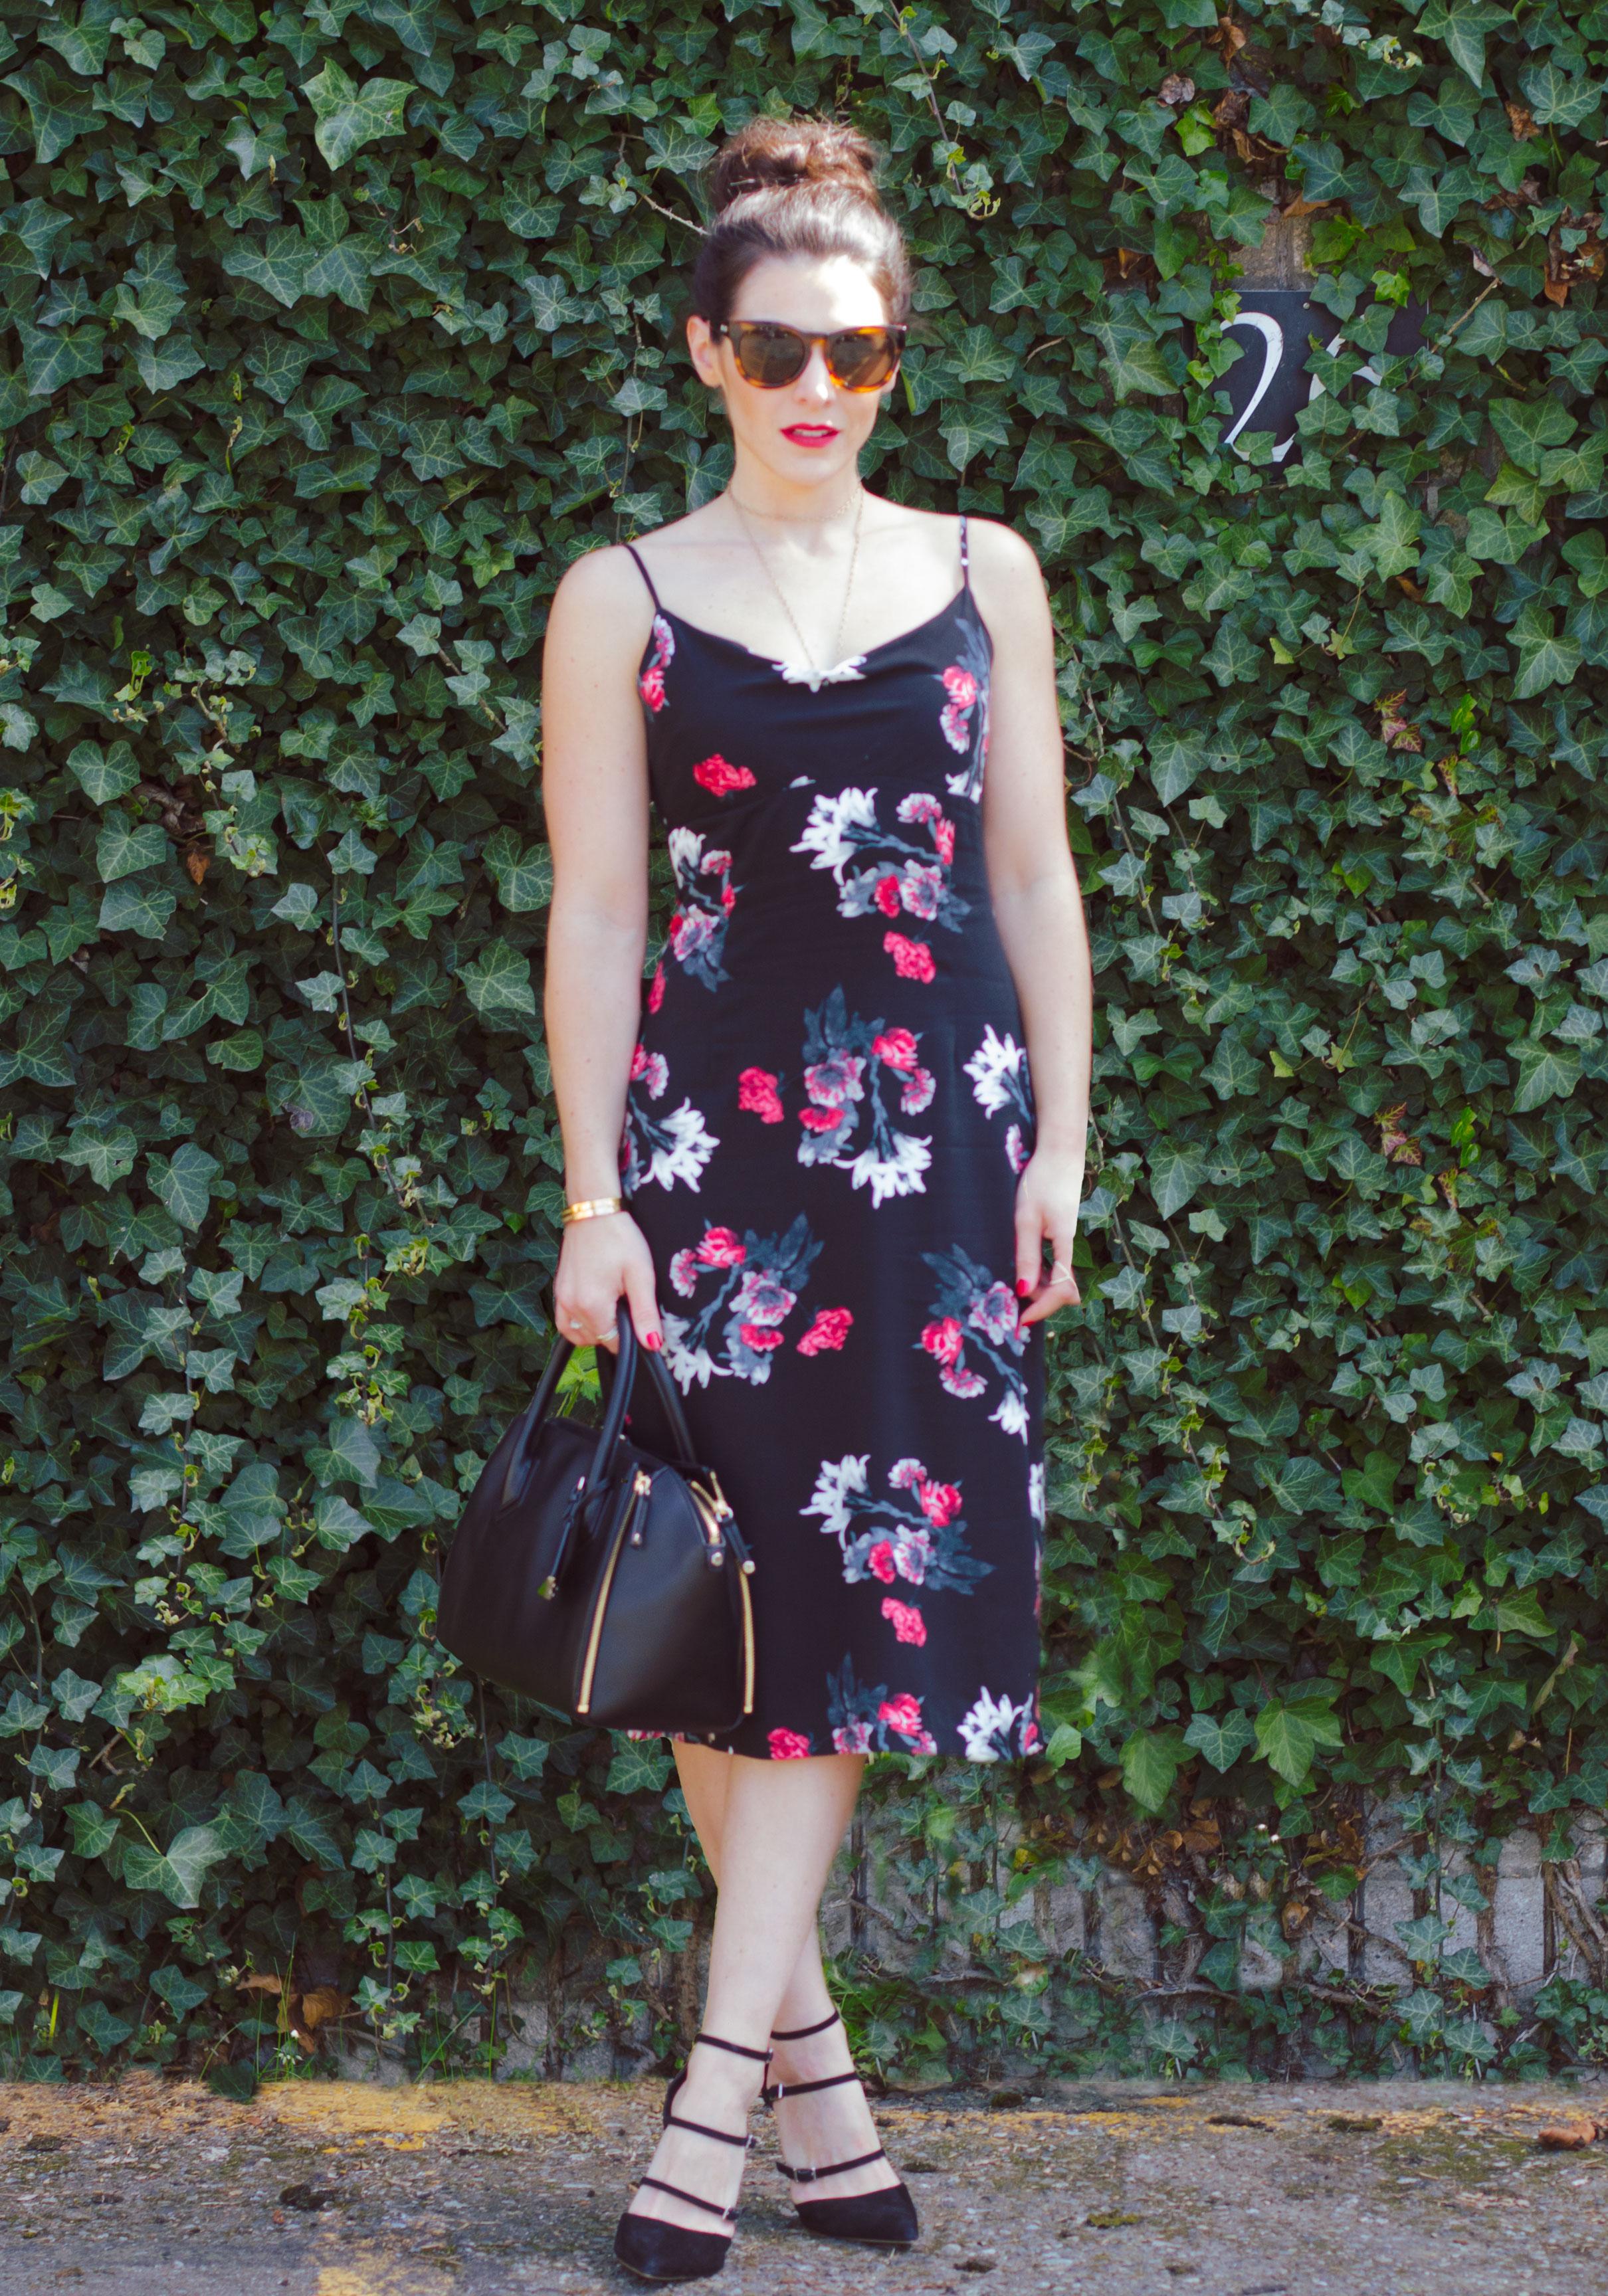 BB Dakota Miriam Floral Midi Dress, Topshop Giselle Buckle Sandals, Messy Topknot, Vince Leather Jacket